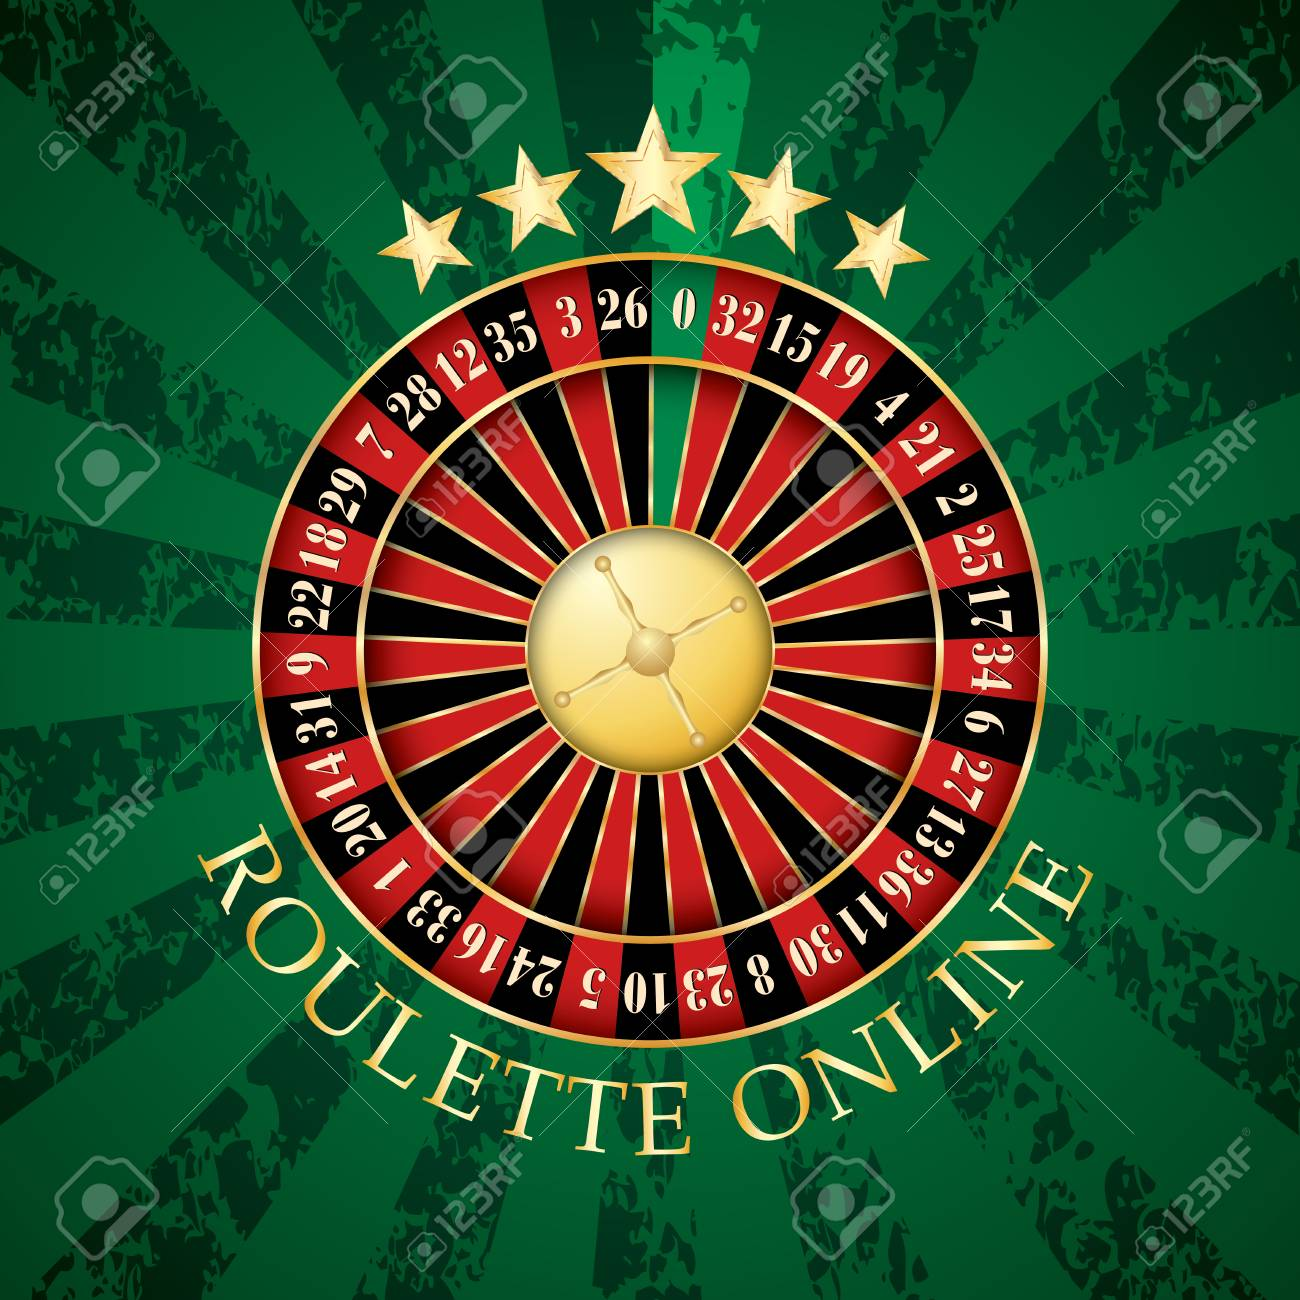 Casino Rama neue